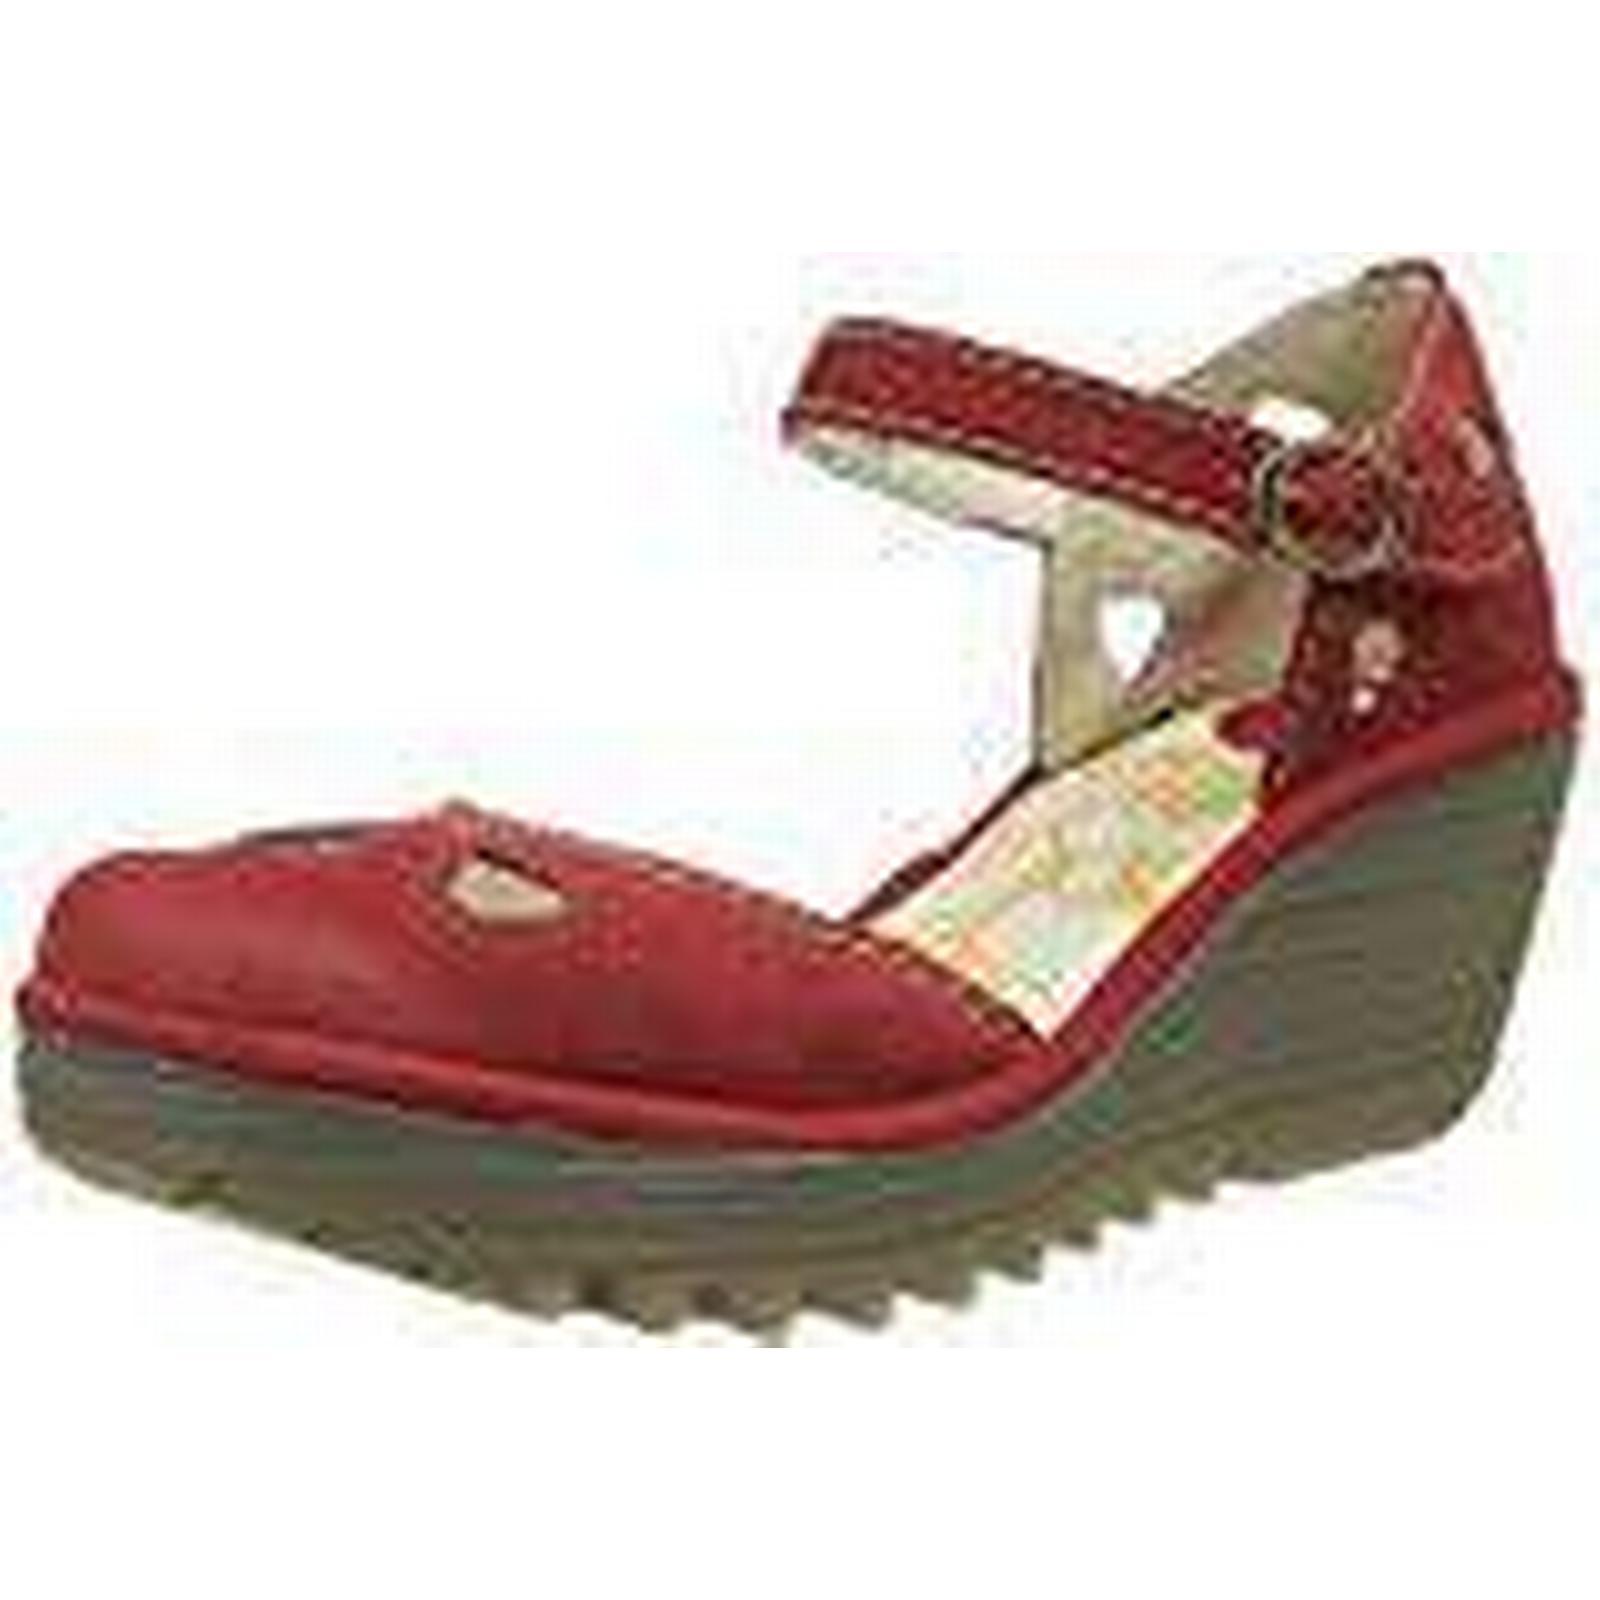 Fly London Women's YUNA Closed 135), Toe Heels, (Lipstick Red 135), Closed 4 (37 EU) fd39cf